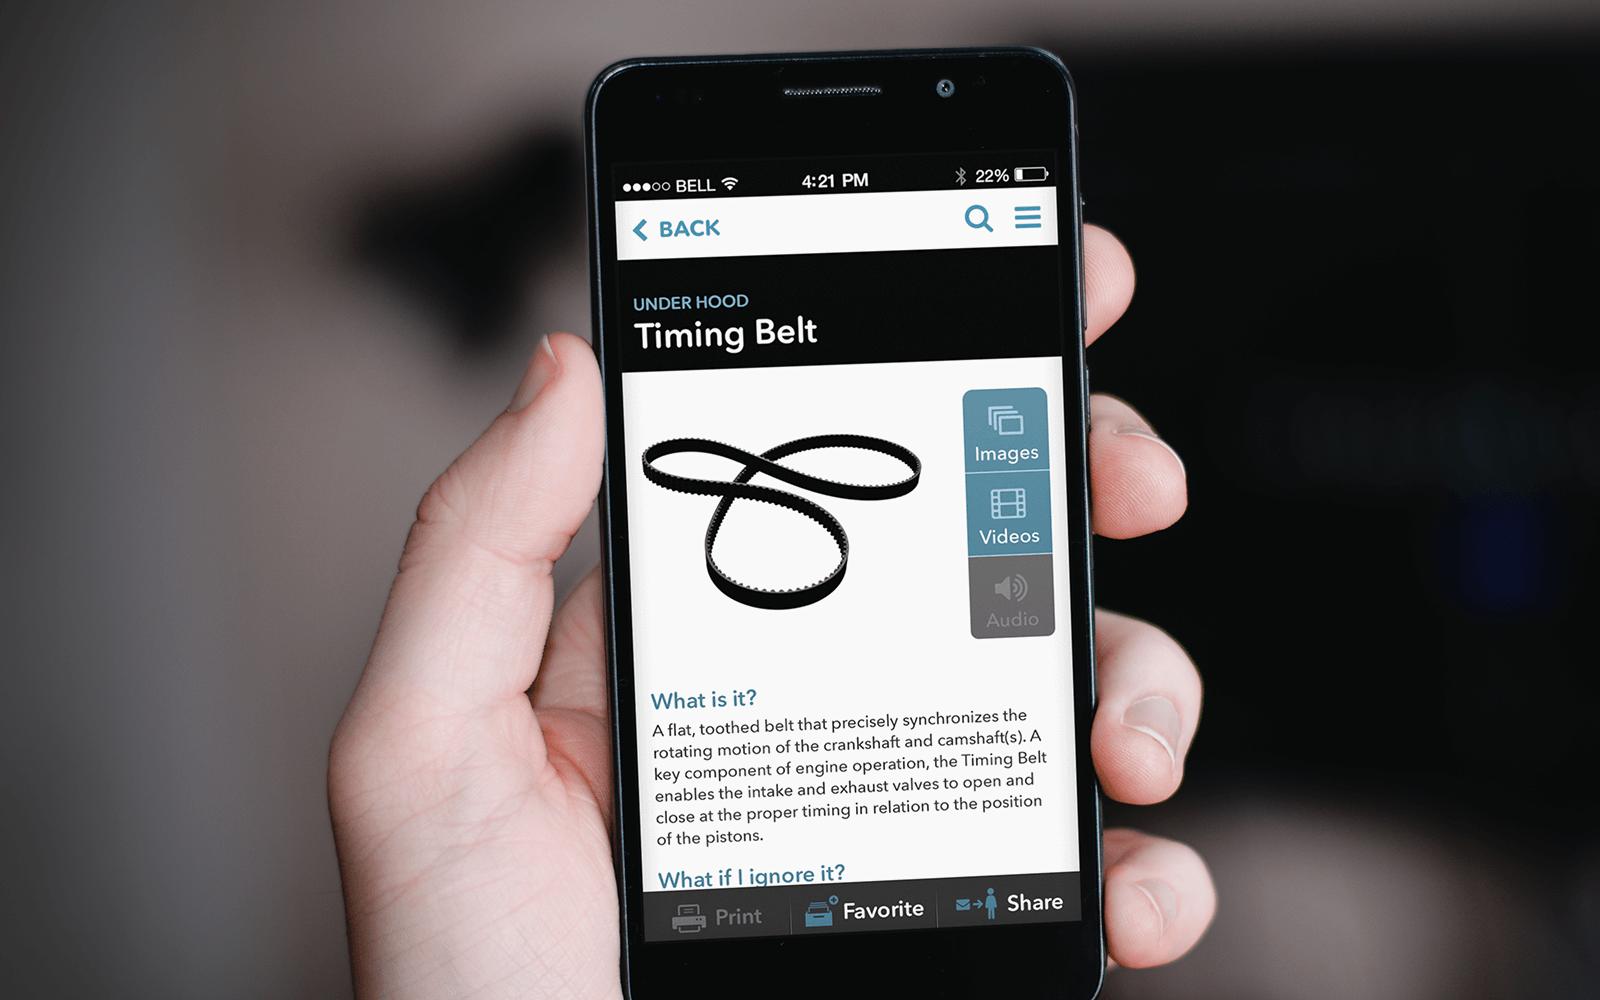 Timing belt detail page